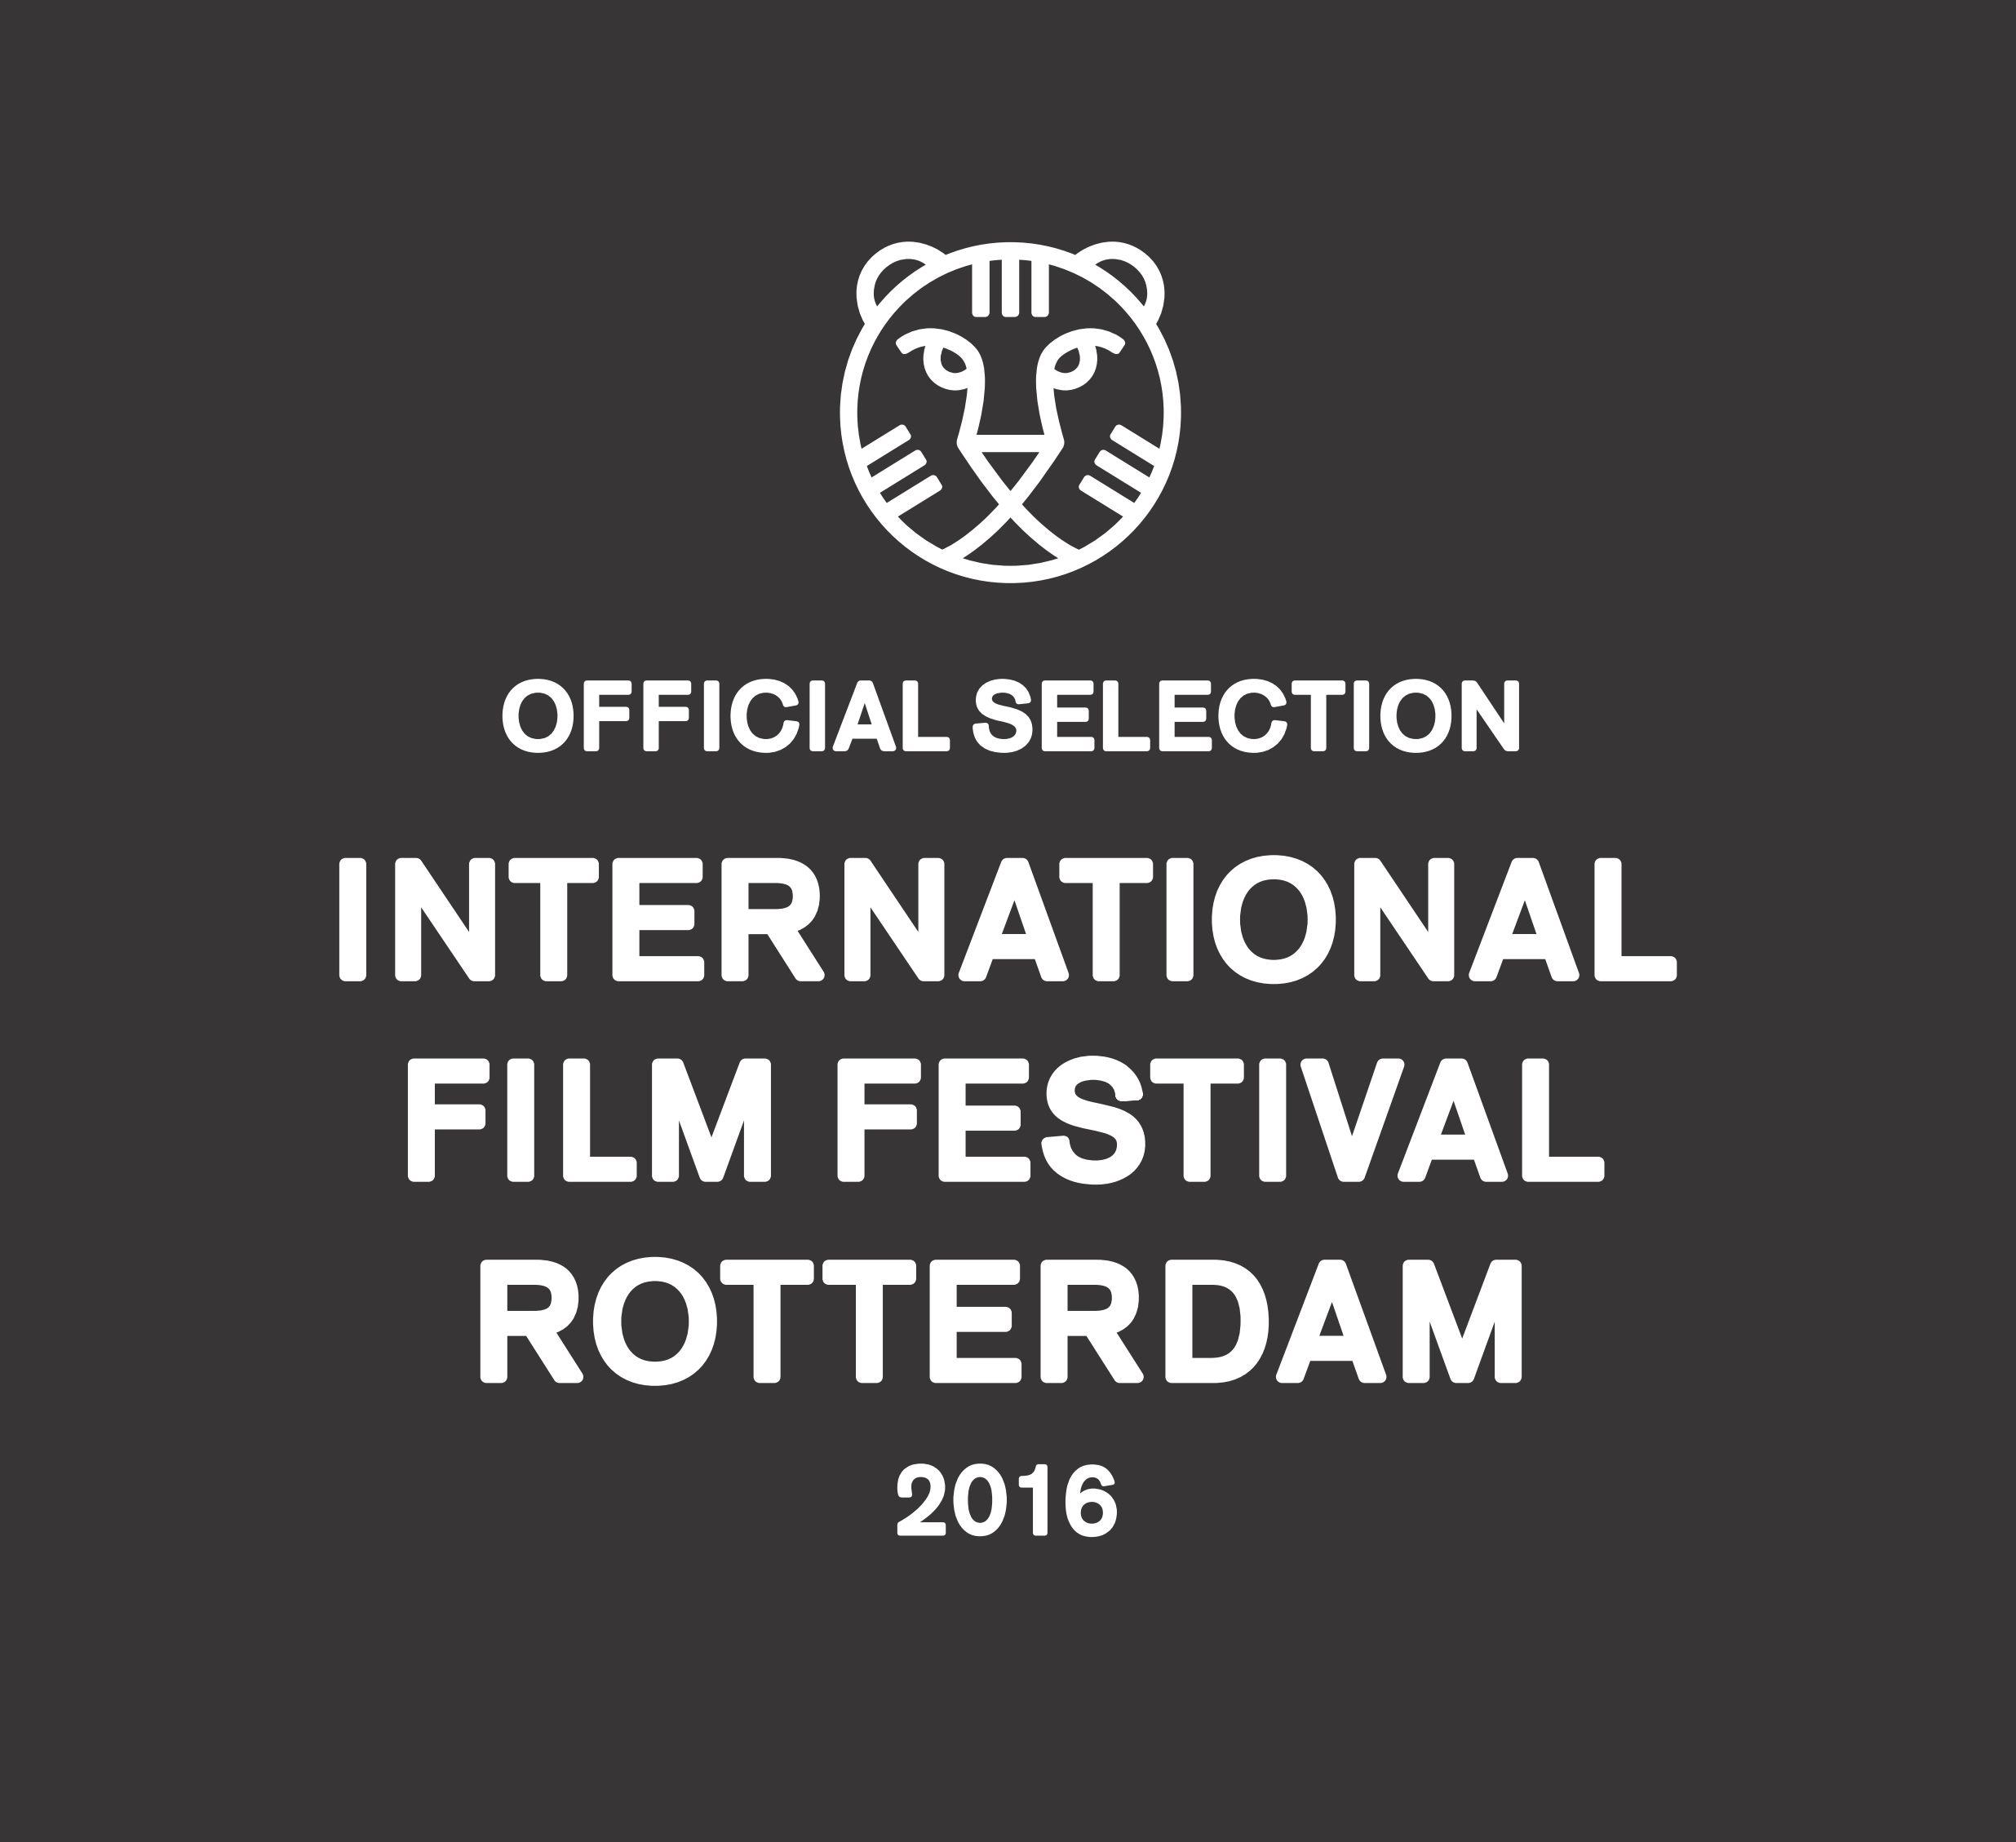 international_film_festival_rotterdam_logo_3129